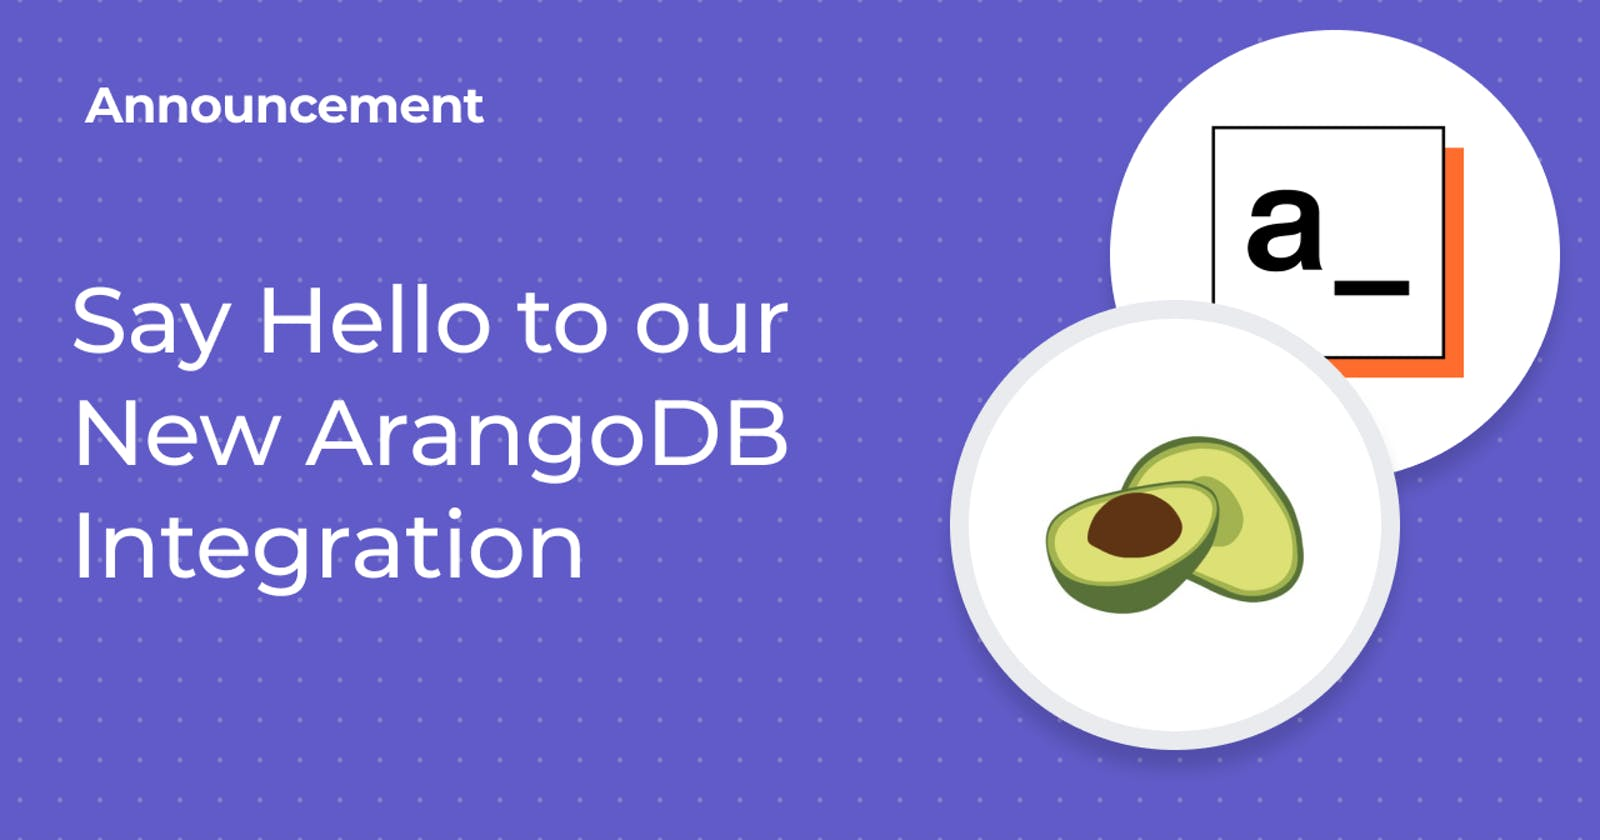 Say Hello to our New ArangoDB Integration